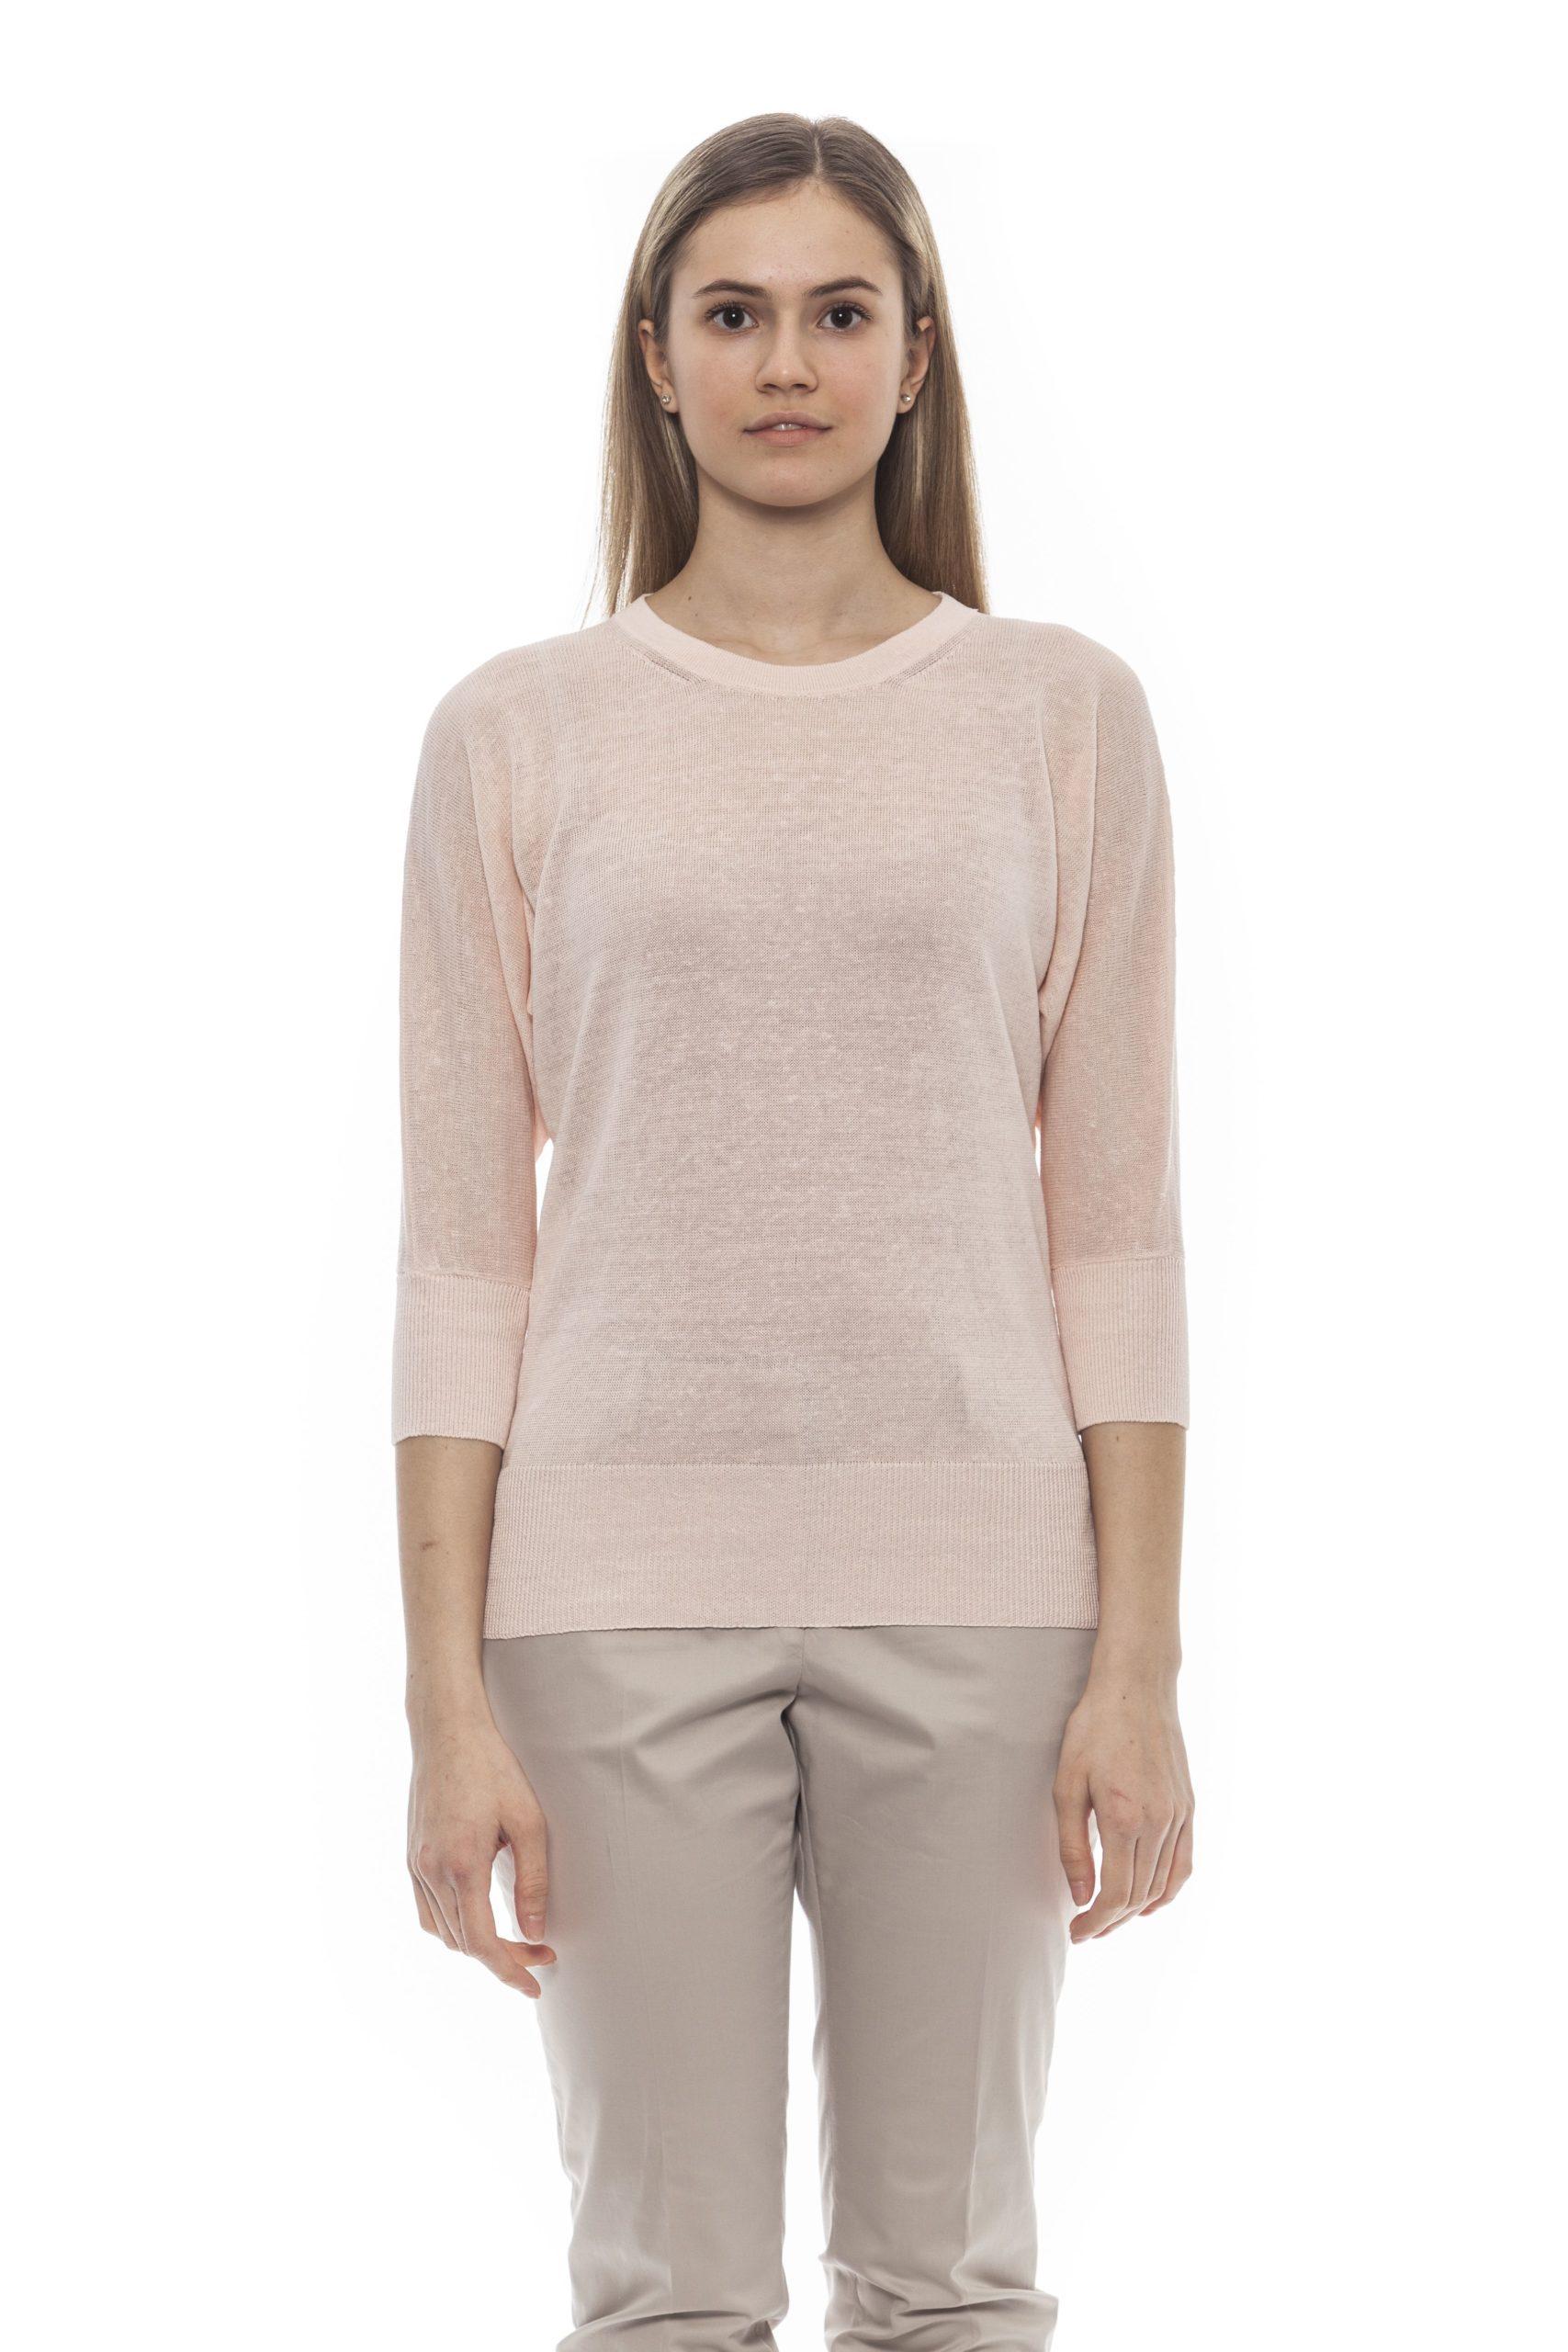 Peserico Women's Rosa Sweater Pink PE1382022 - IT42 | S